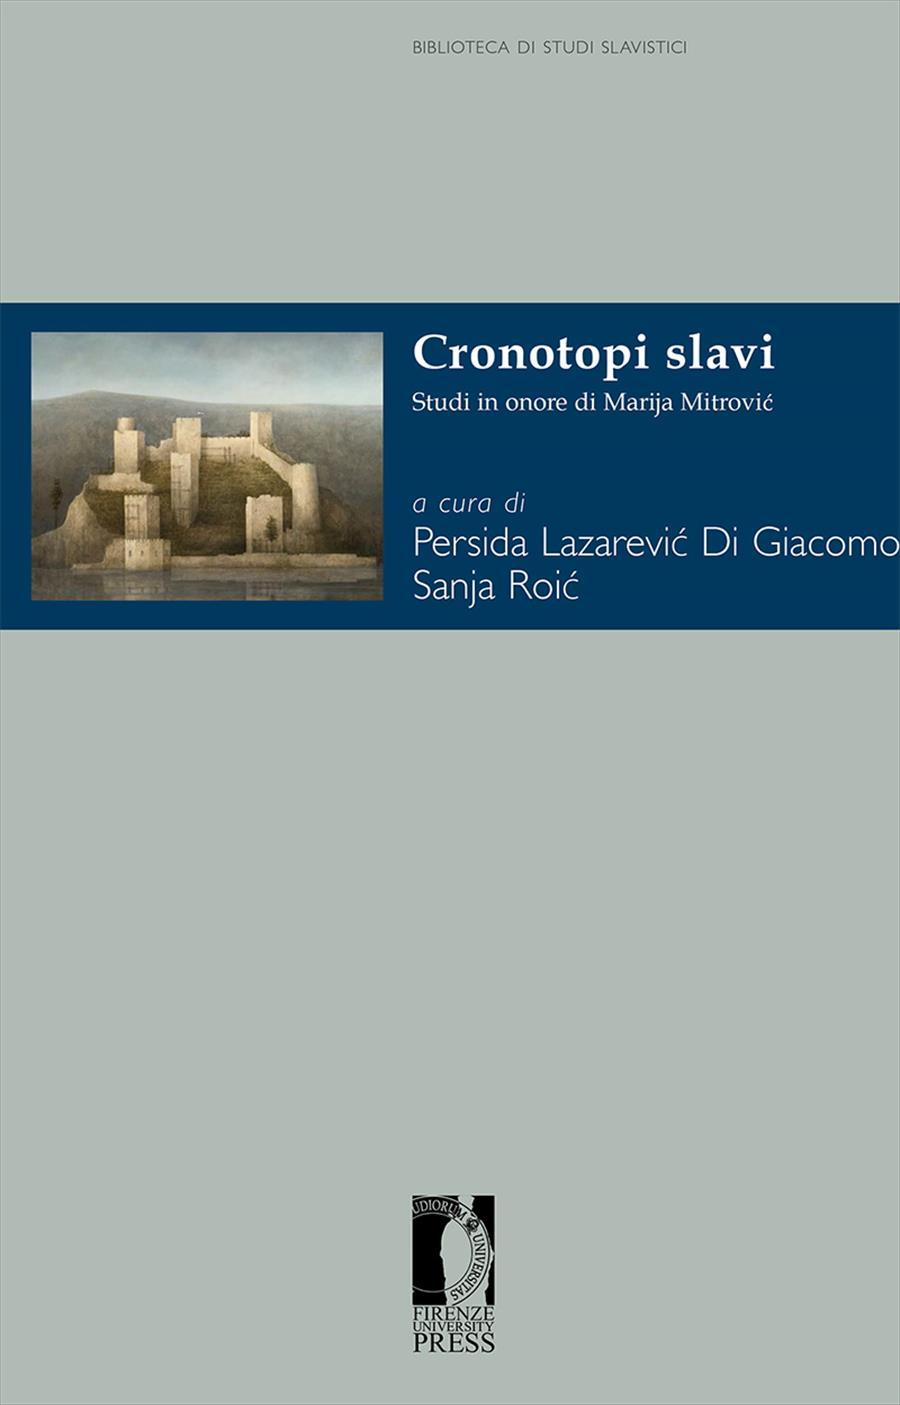 Cronotopi slavi. Studi in onore di Marija Mitrović